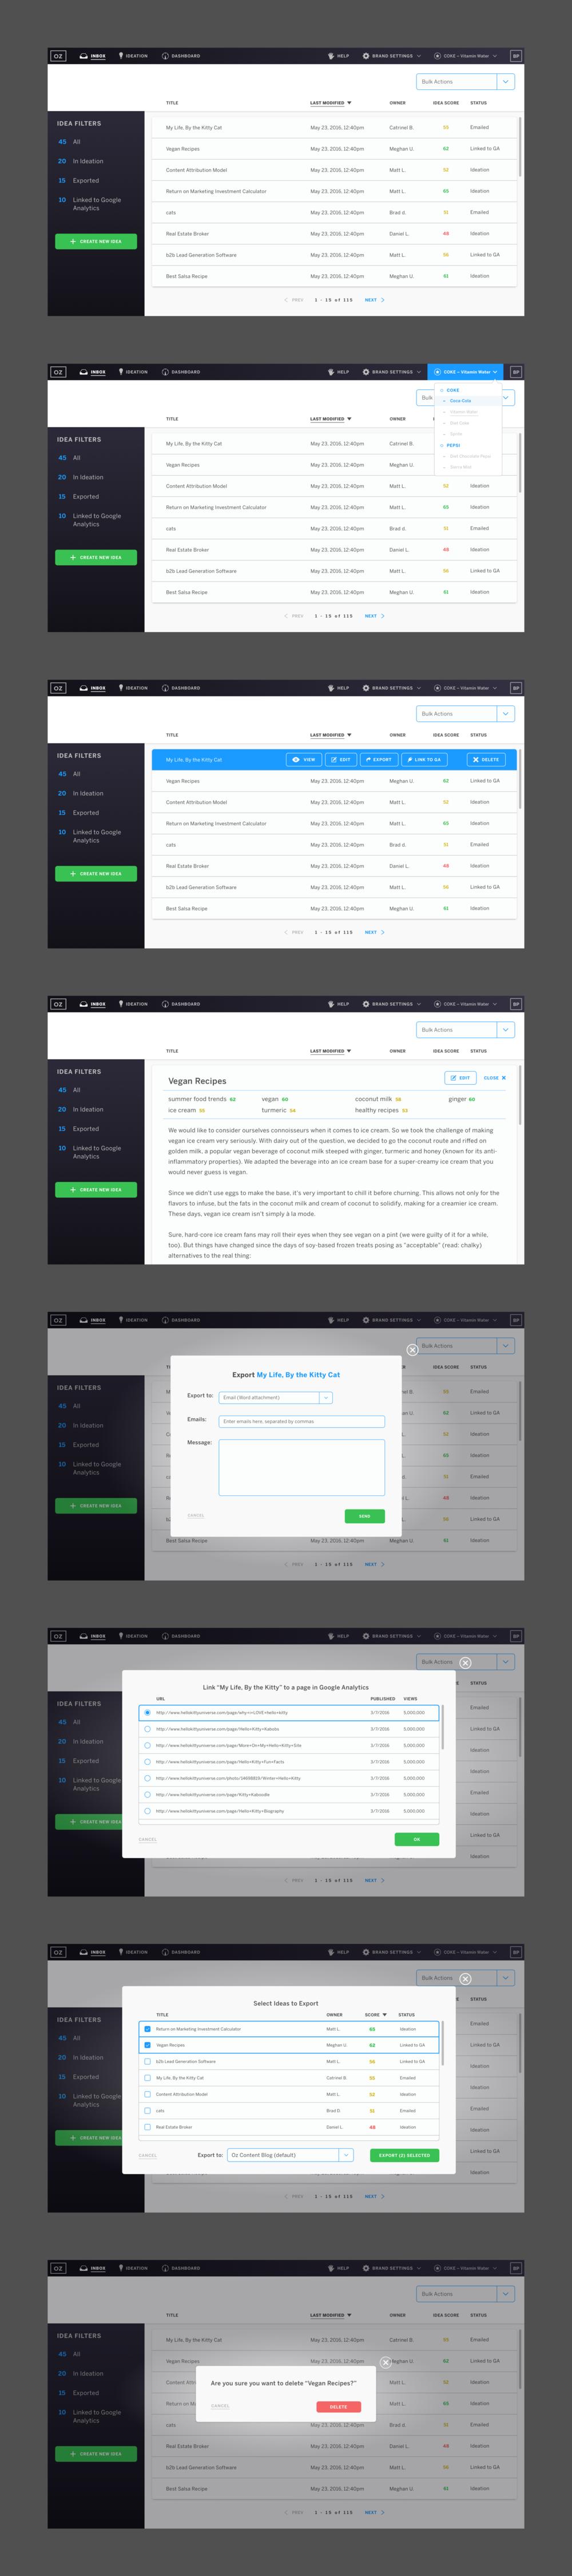 Oz_Content_Inbox